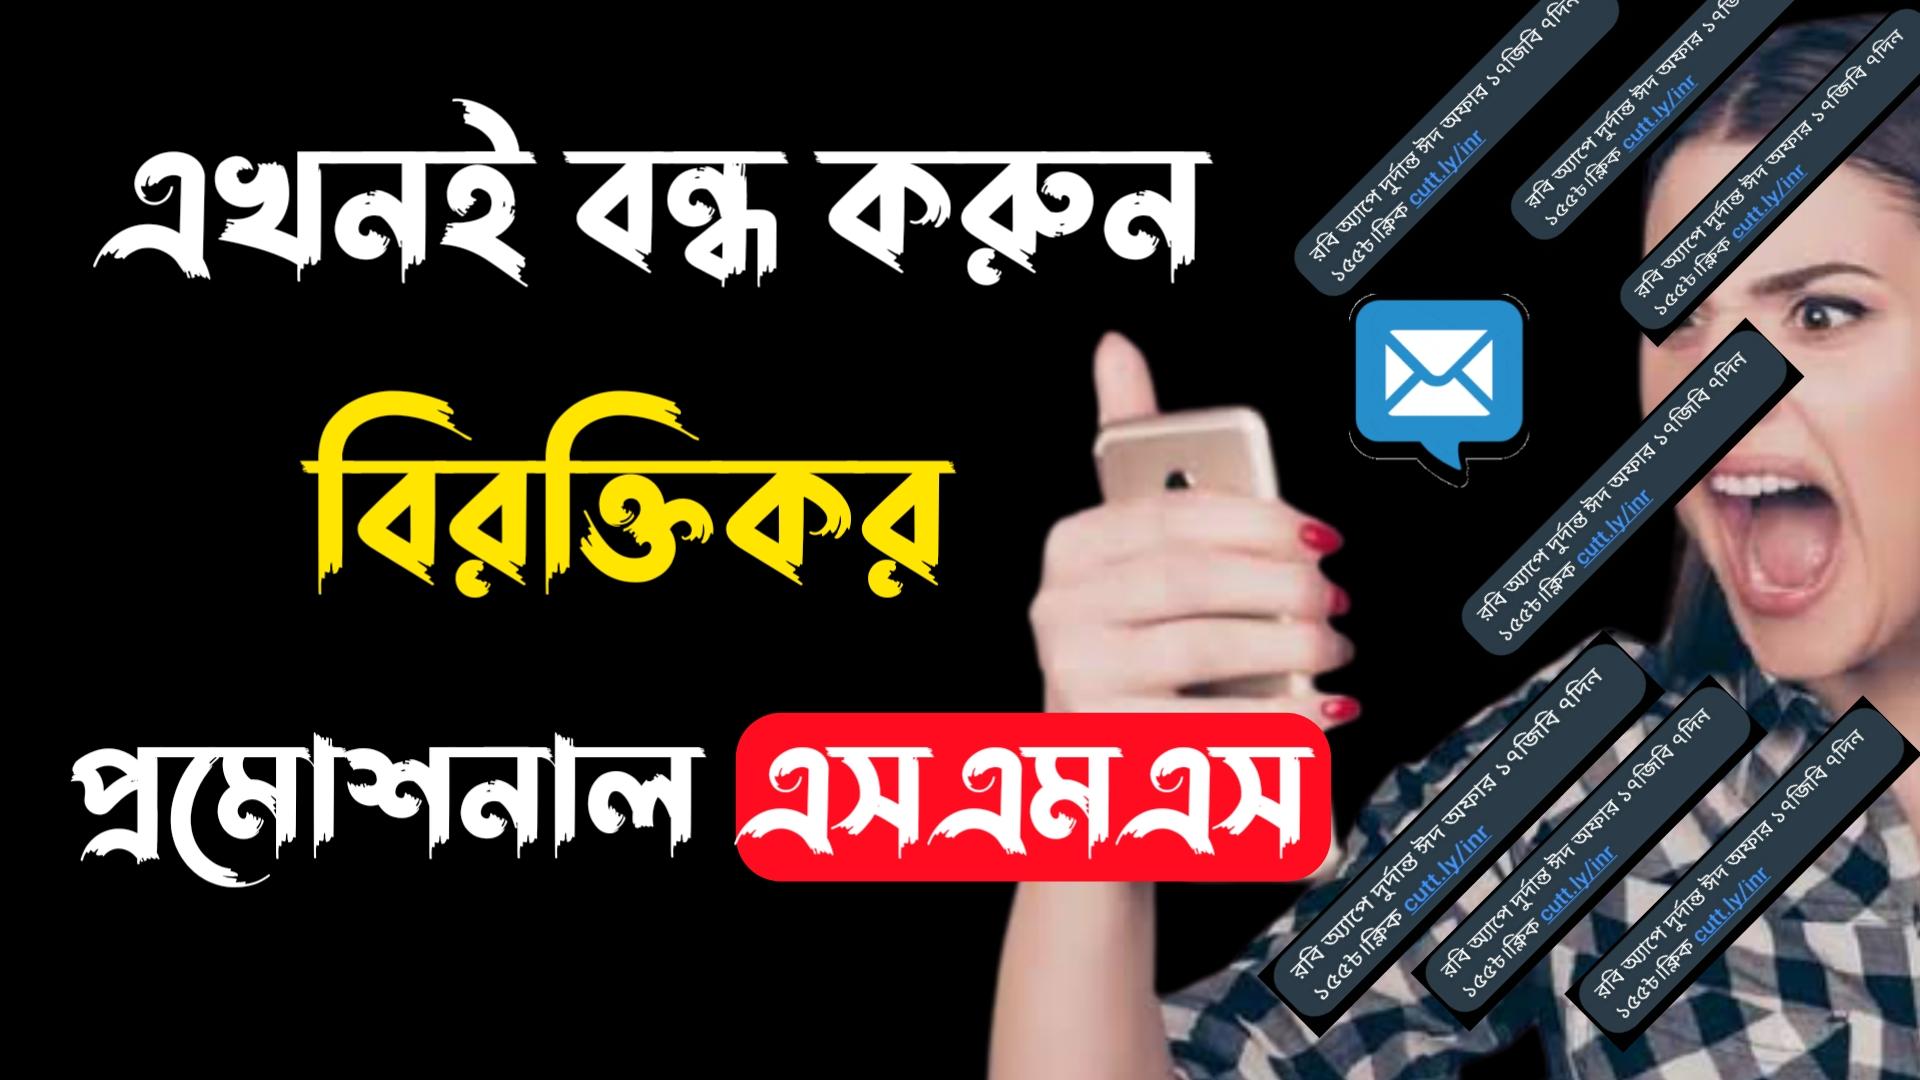 DO NOT DISTURB || বিরক্তিকর এসএমএস সার্ভিস বন্ধ করুন || BTRC || SBANGLAPRO